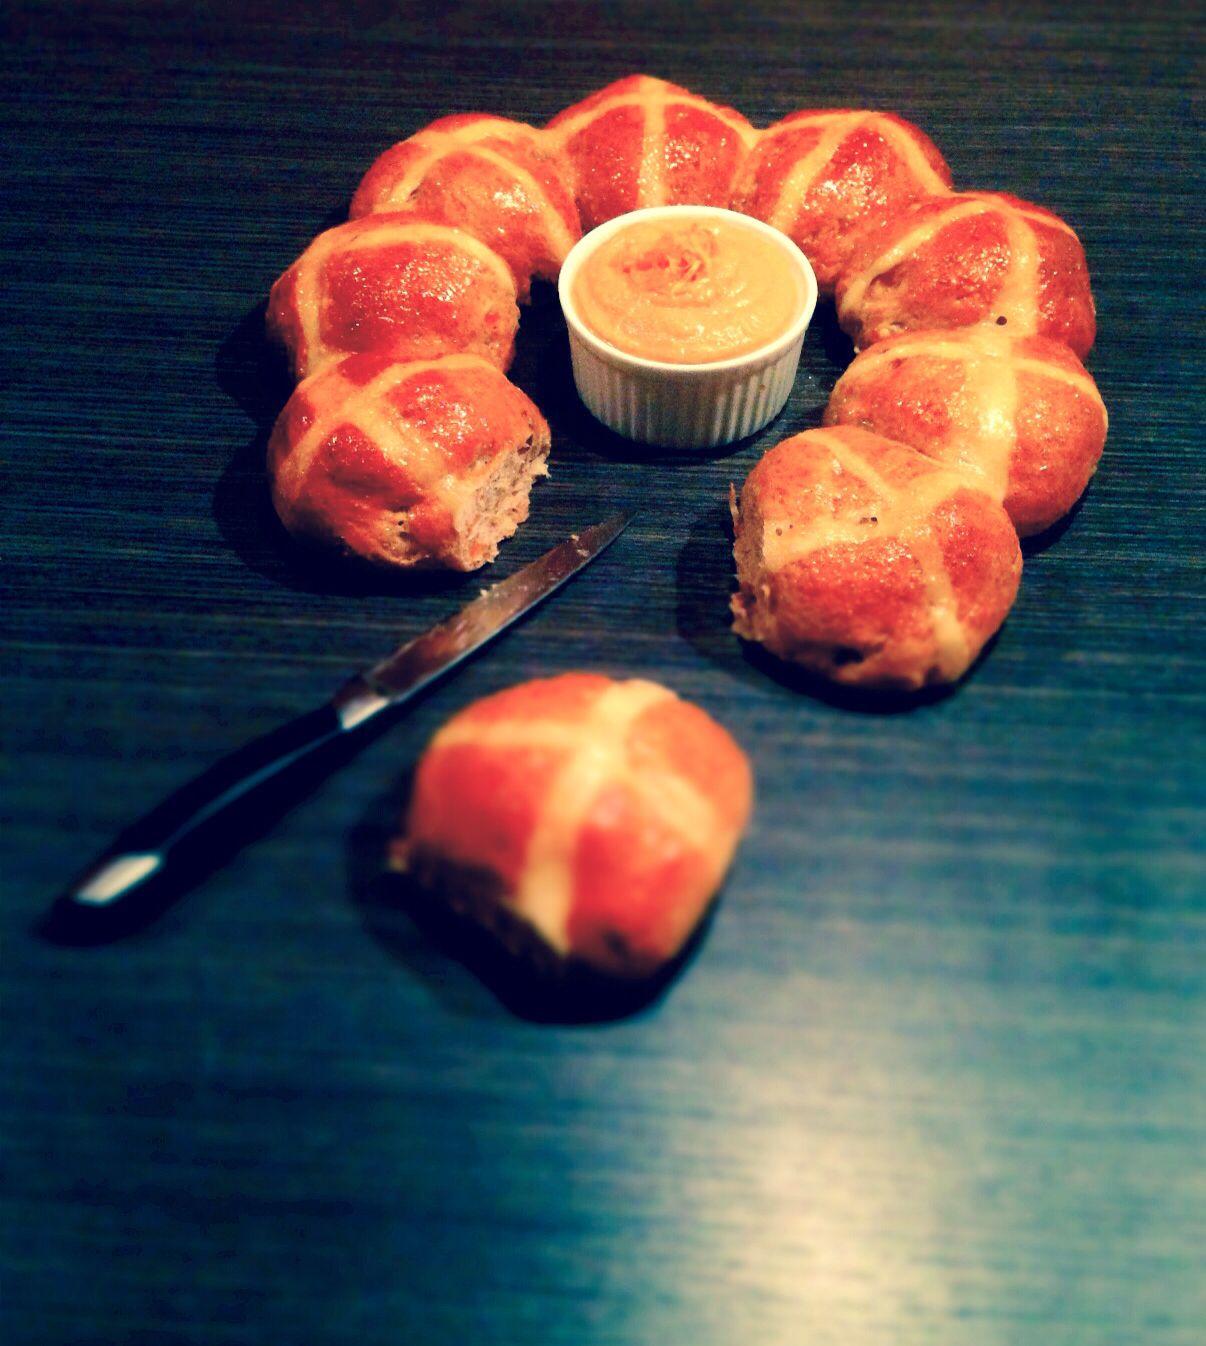 Hot Cross Buns per la #Re-Cake di aprile http://peppersmatter.wordpress.com/2014/04/27/hot-cross-buns-per-la-re-cake-di-aprile/